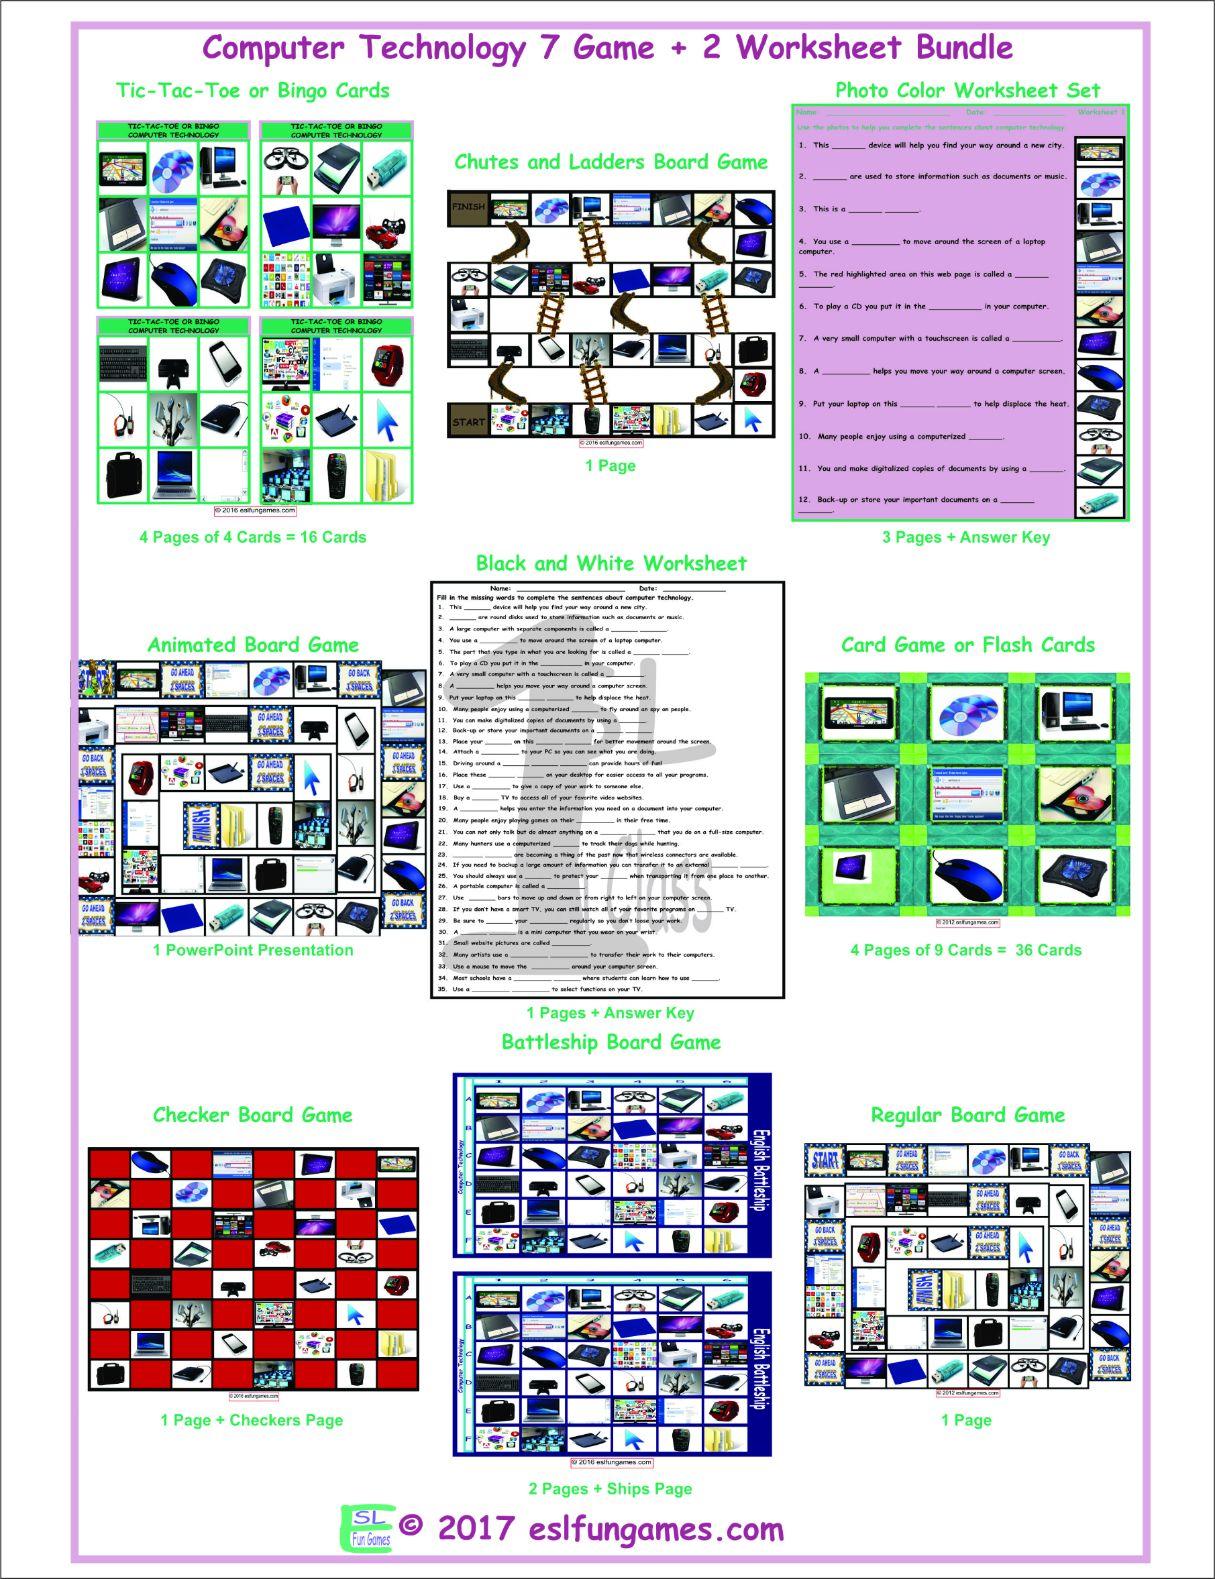 Computer Technology 7 Game Plus 2 Worksheet Bundle